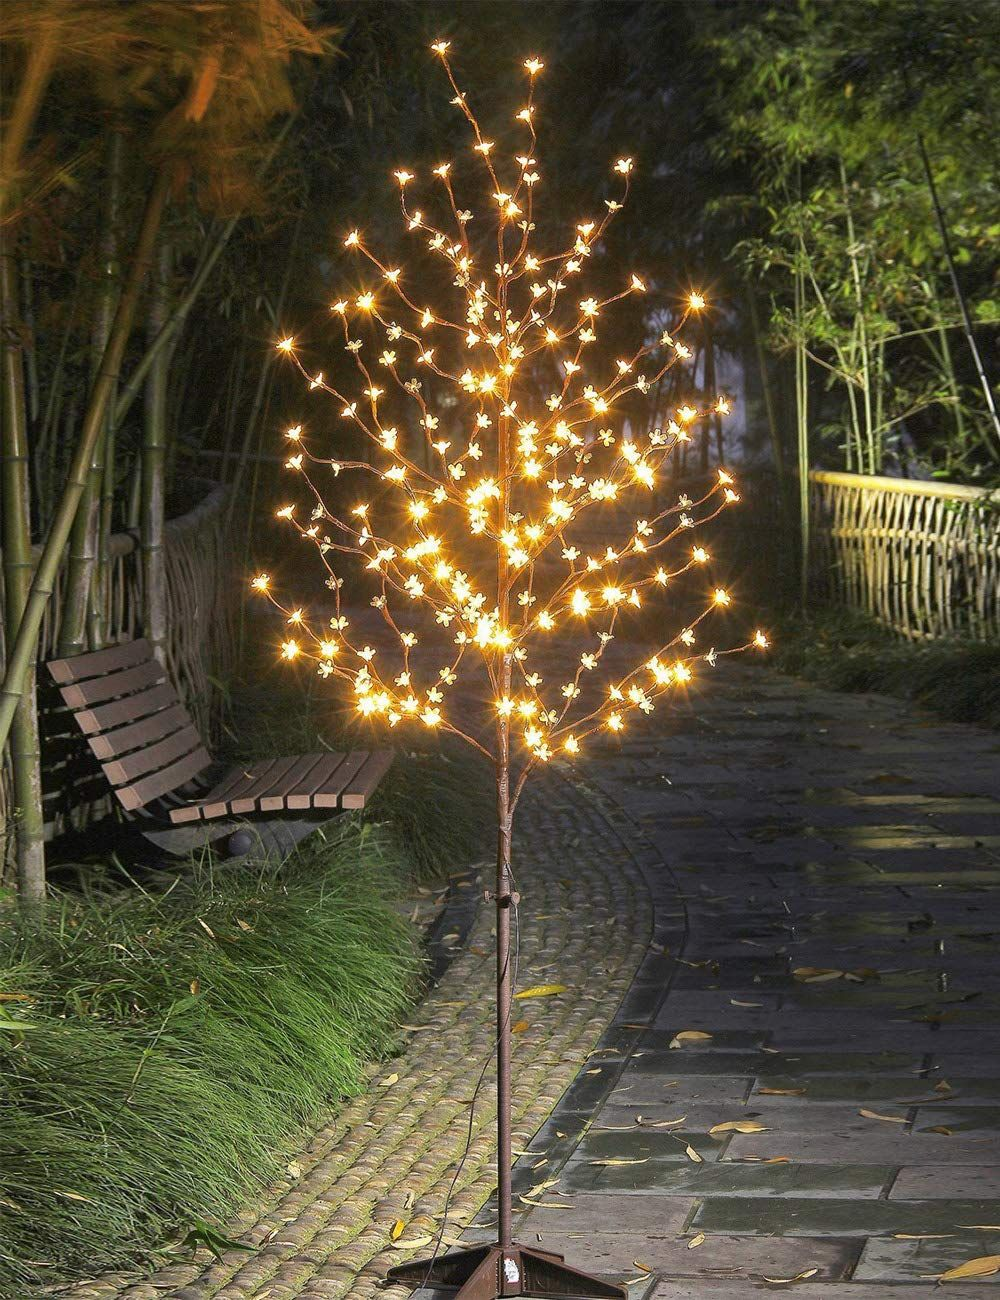 Hi Line Gift Ltd Cherry Blossom Tree 288 Light Lamp In 2021 Cherry Blossom Light Tree Cherry Blossom Tree Lighted Tree Branches